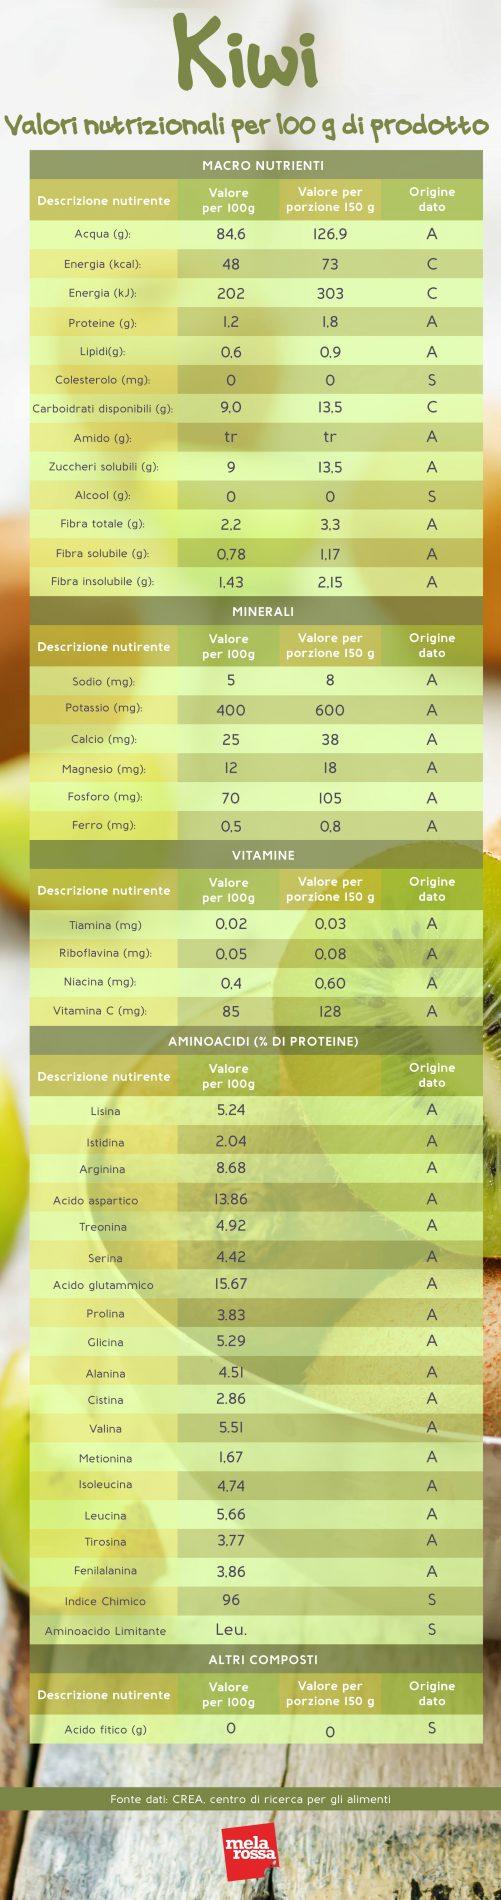 kiwi: valores nutricionales